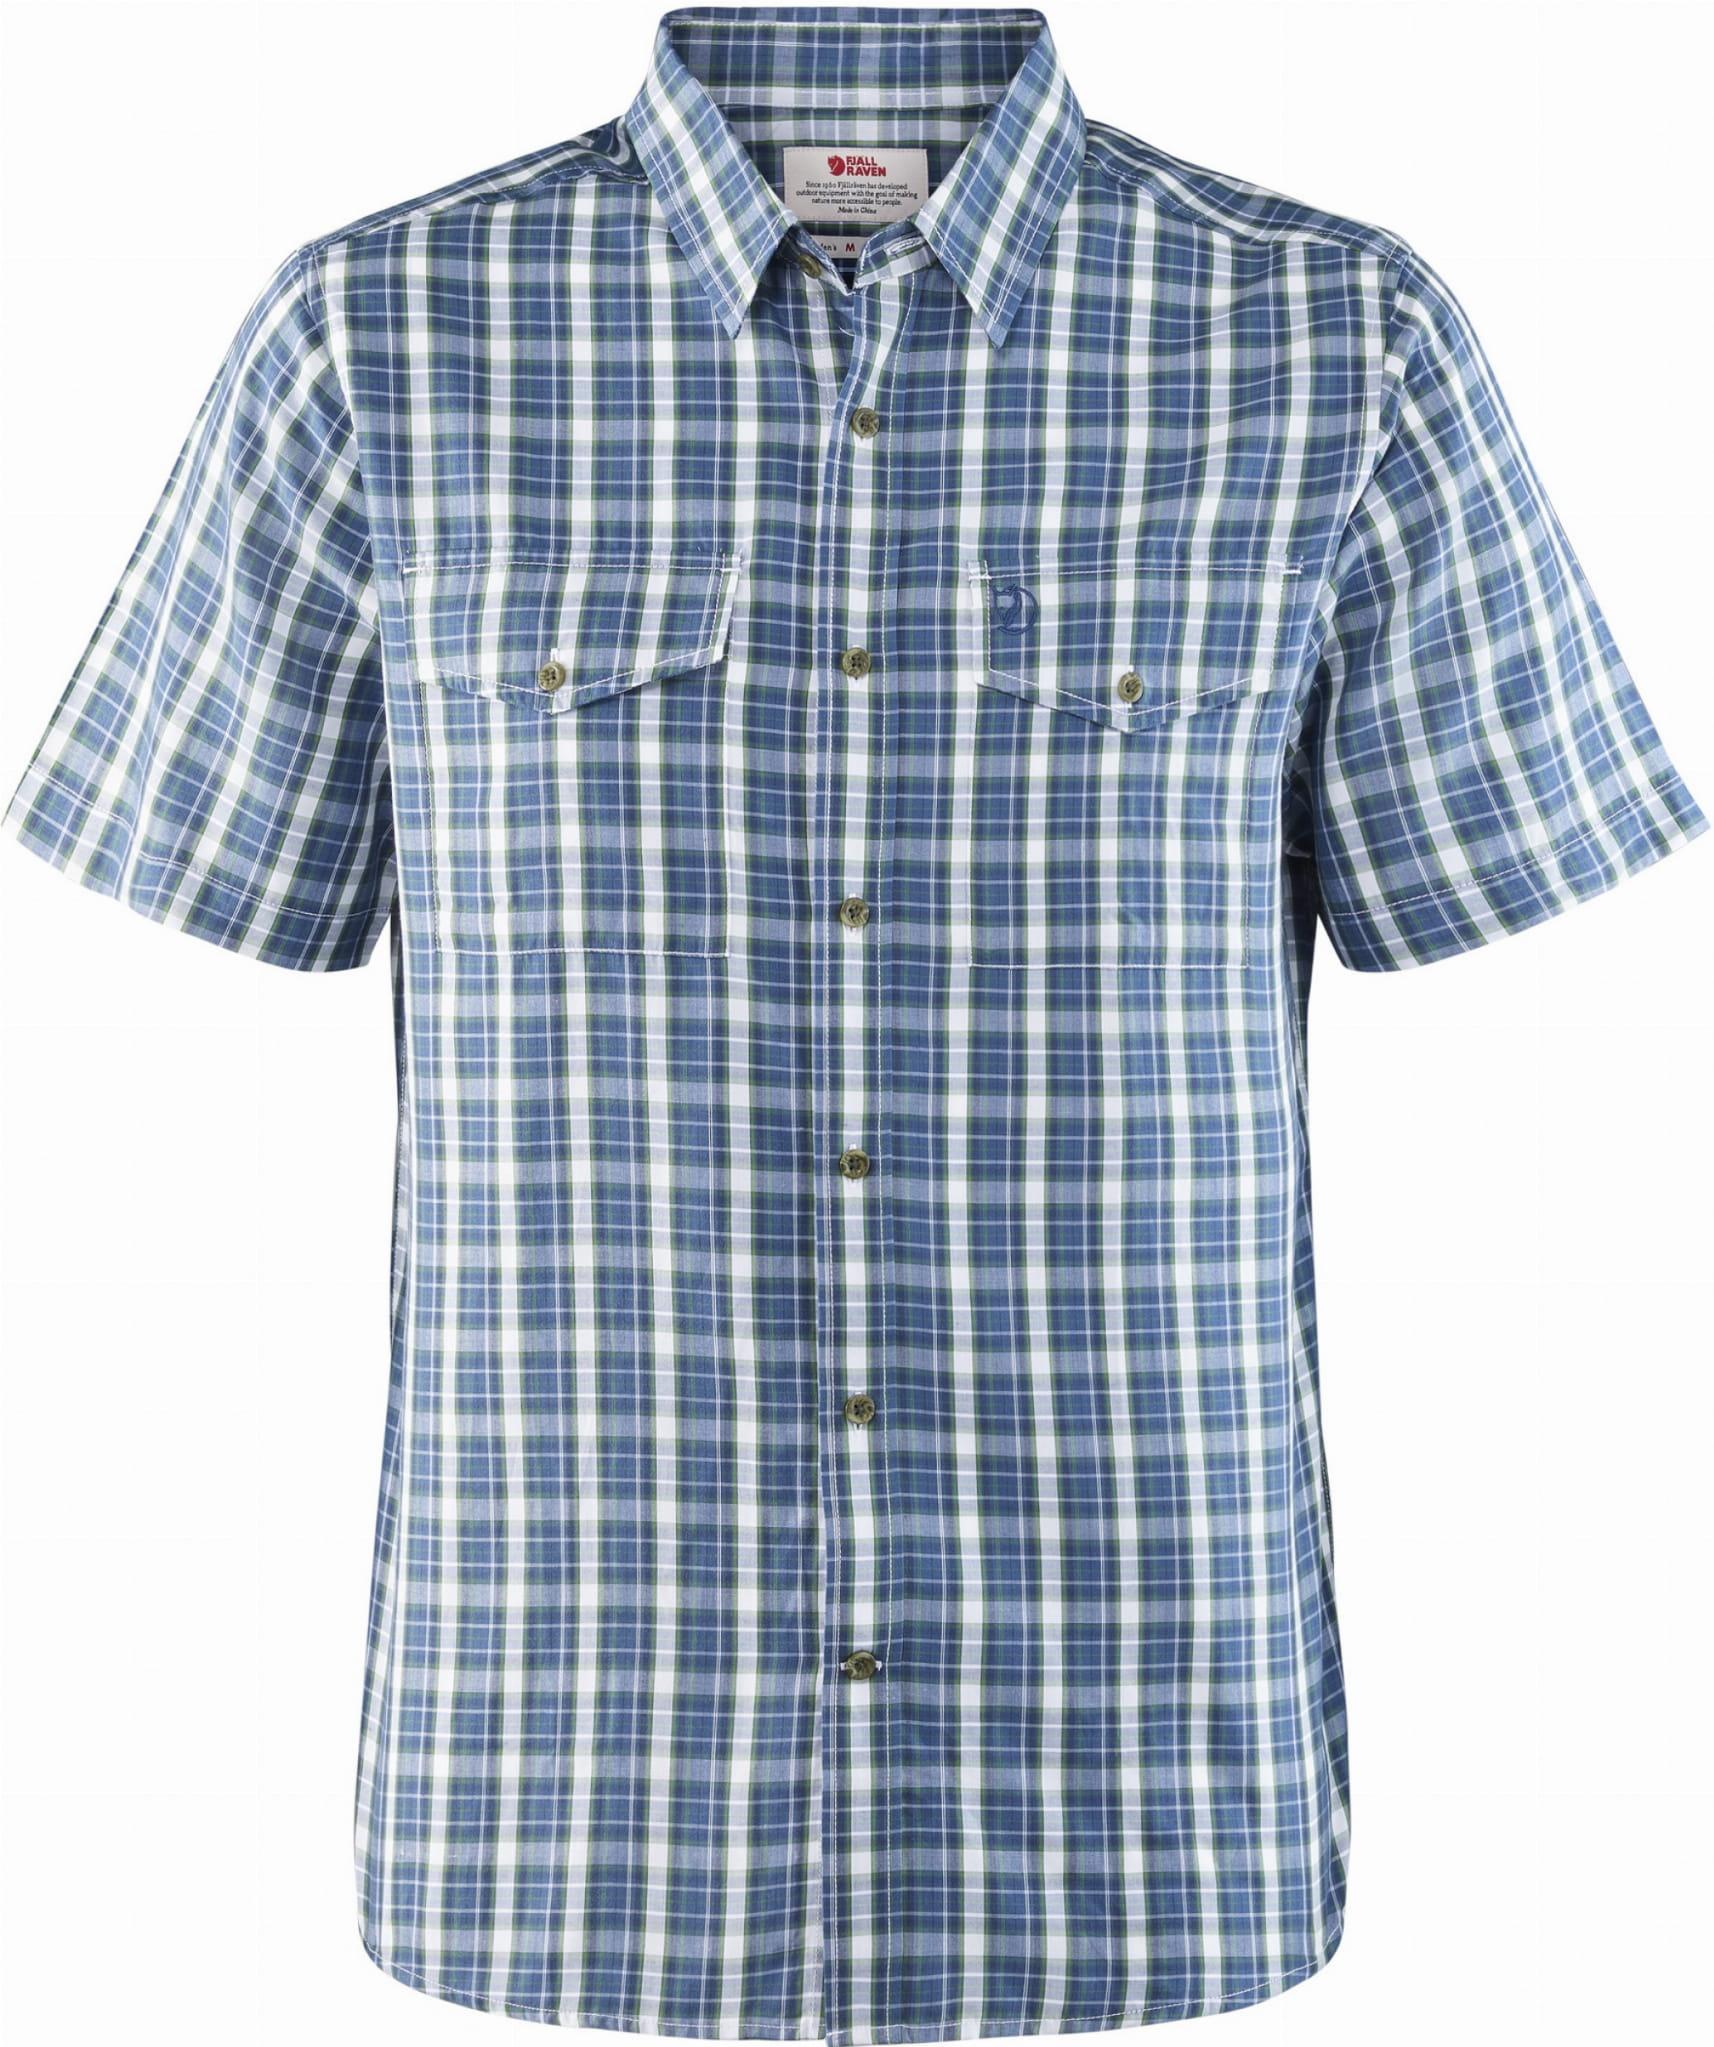 6b6eda847ecb Abisko cool shirt ss - 81795- Fjallraven-shop.pl